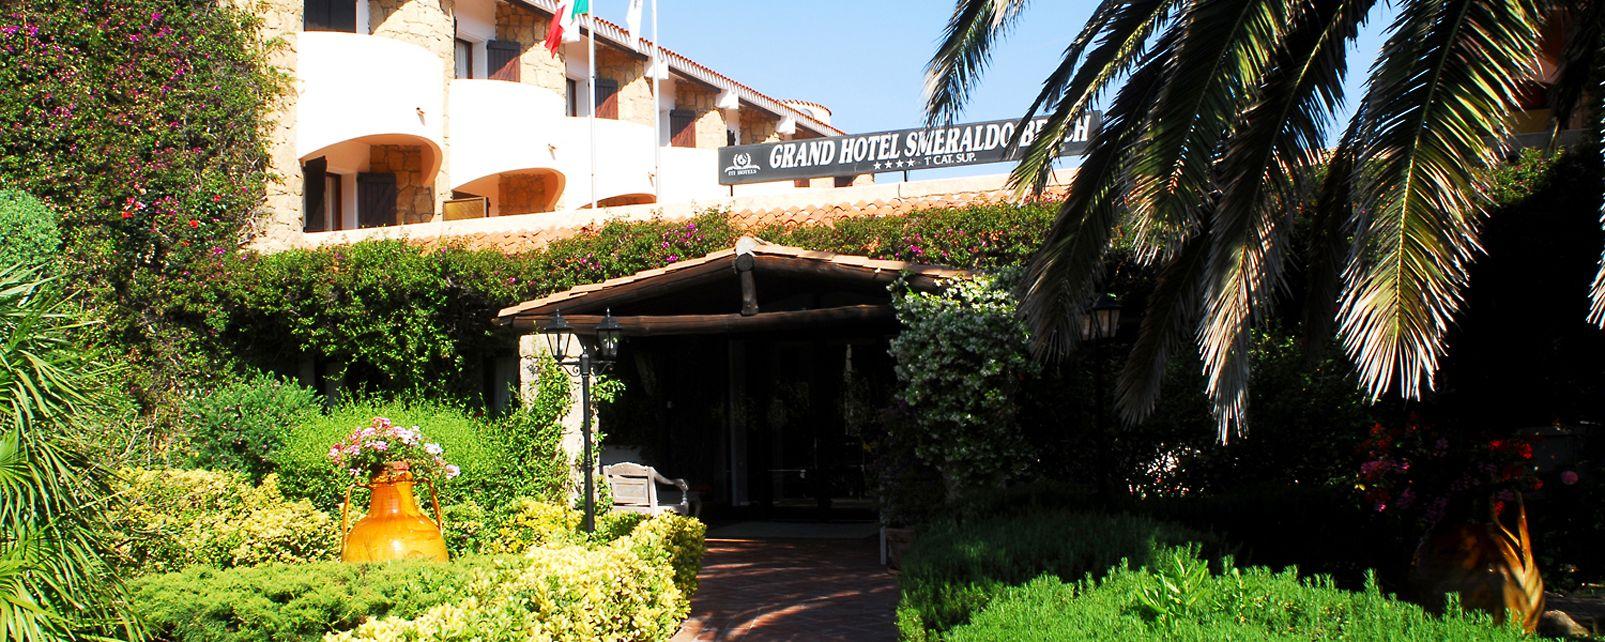 Hotel Smeraldo Beach